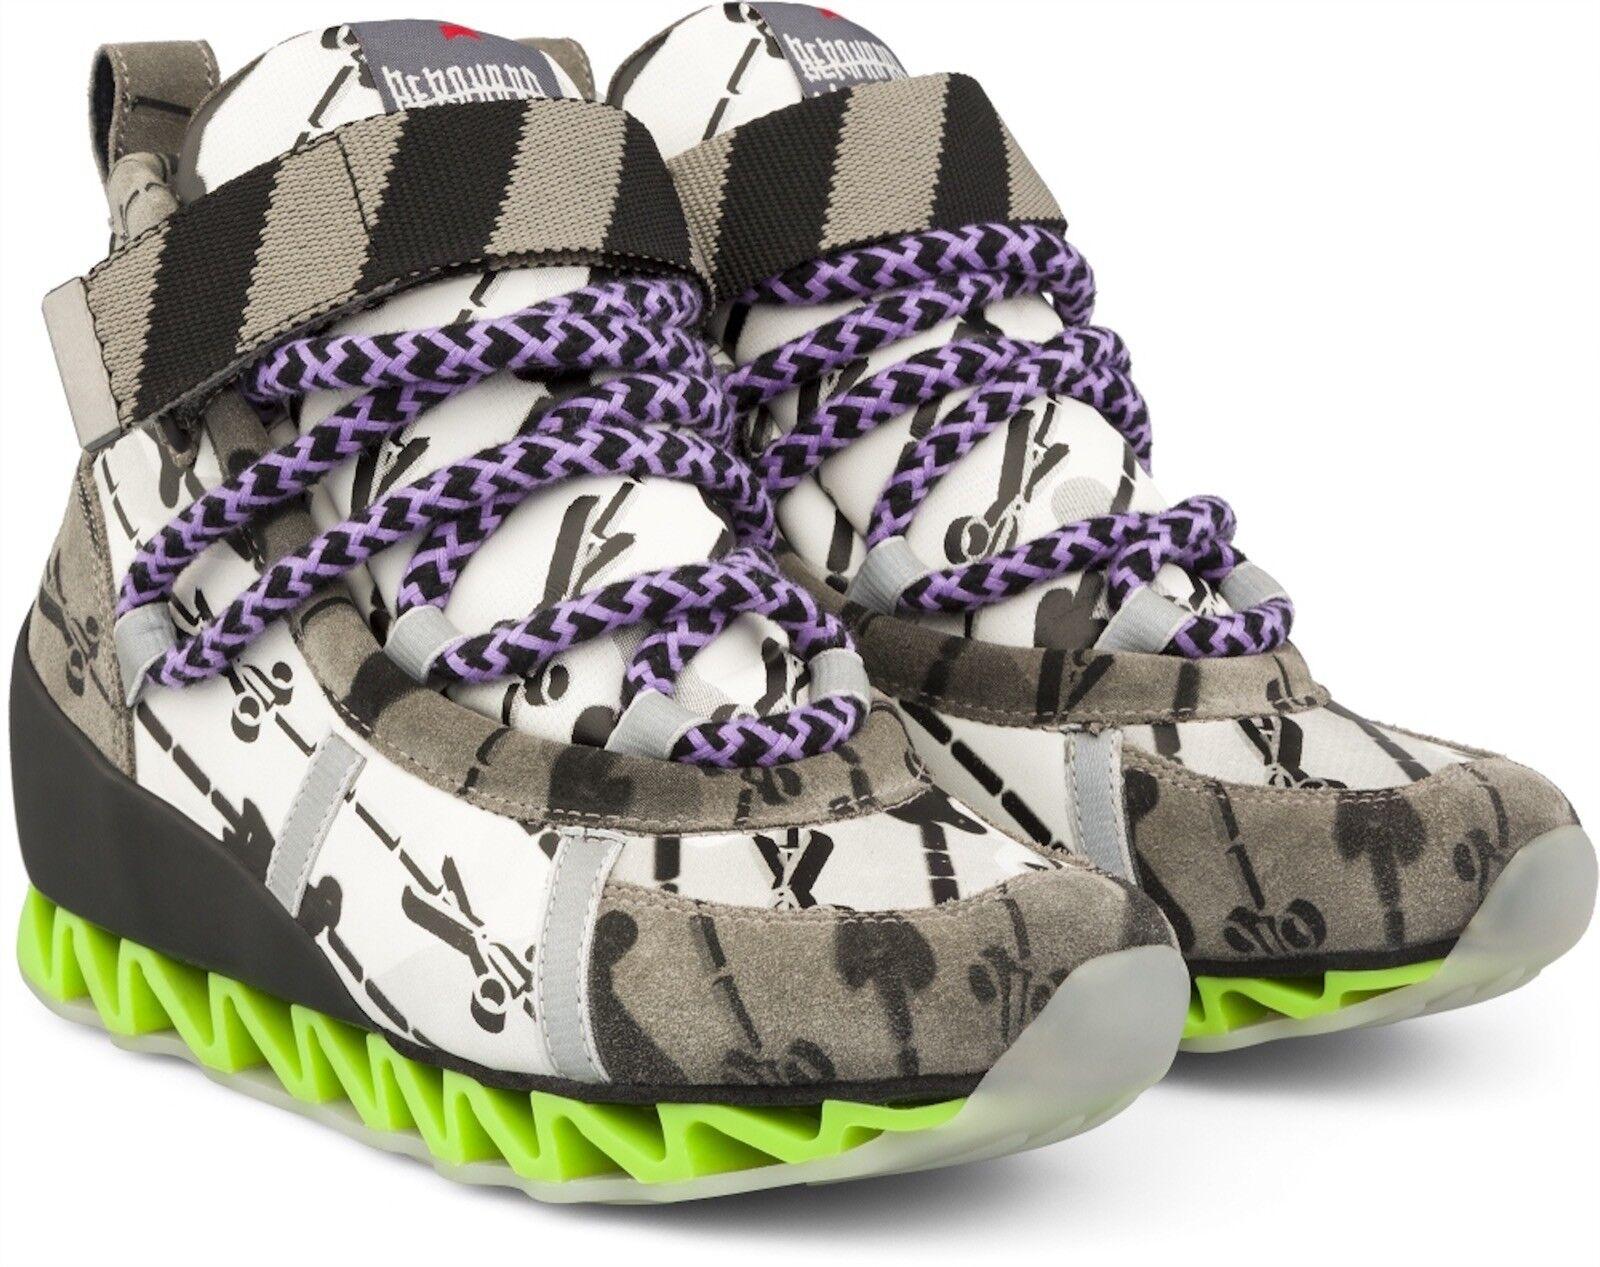 320 Bernhard Willhelm X Camper US 7 EU 37 Together Himalayan Sneakers 46489-015